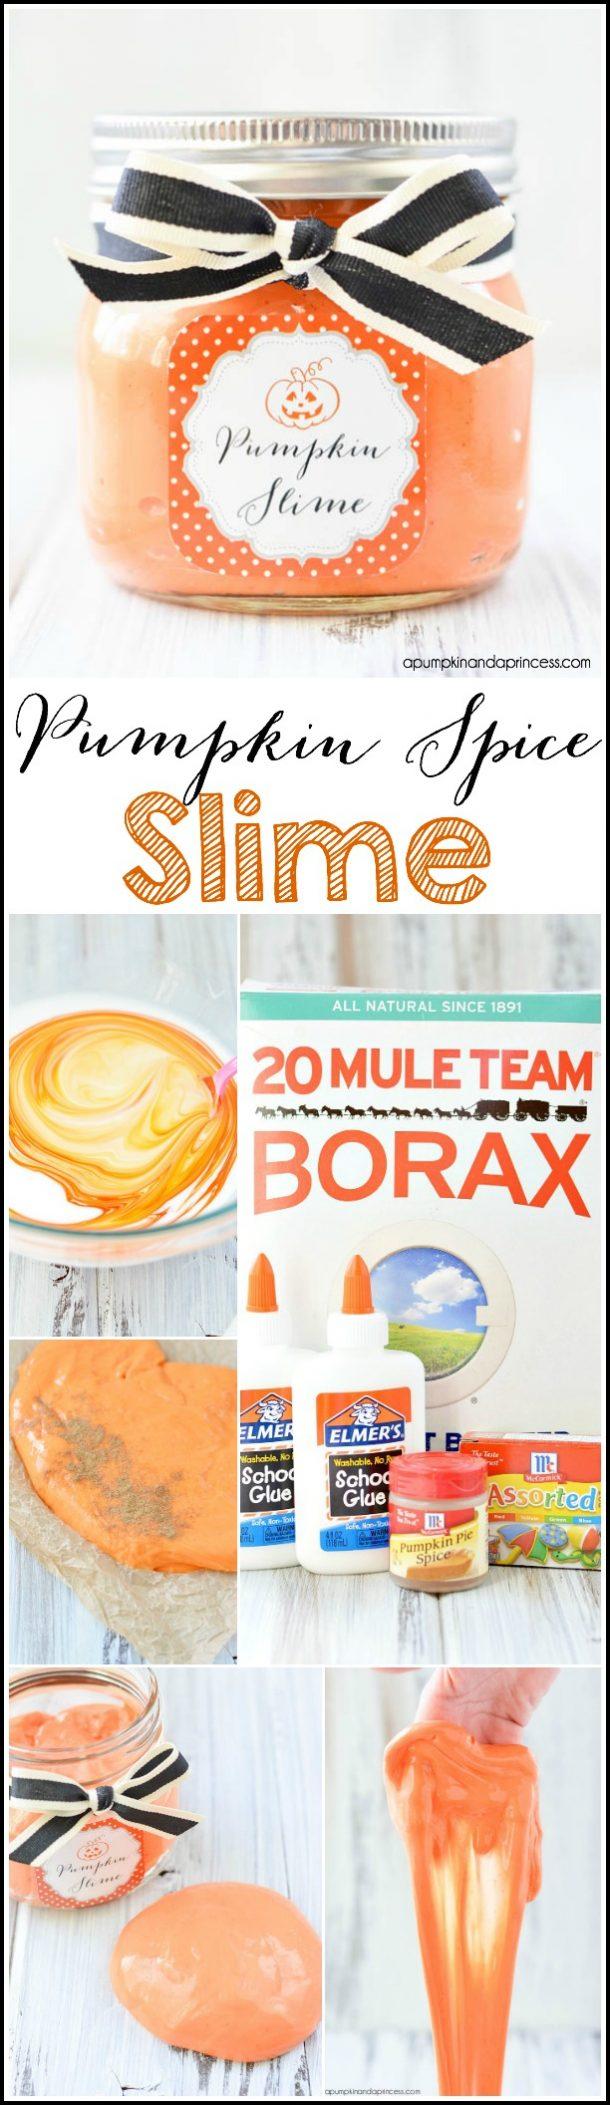 Non-Candy Halloween Treats and Favors Ideas and Recipes - Pumpkin Spice Slime via A Pumpkin and A Princess